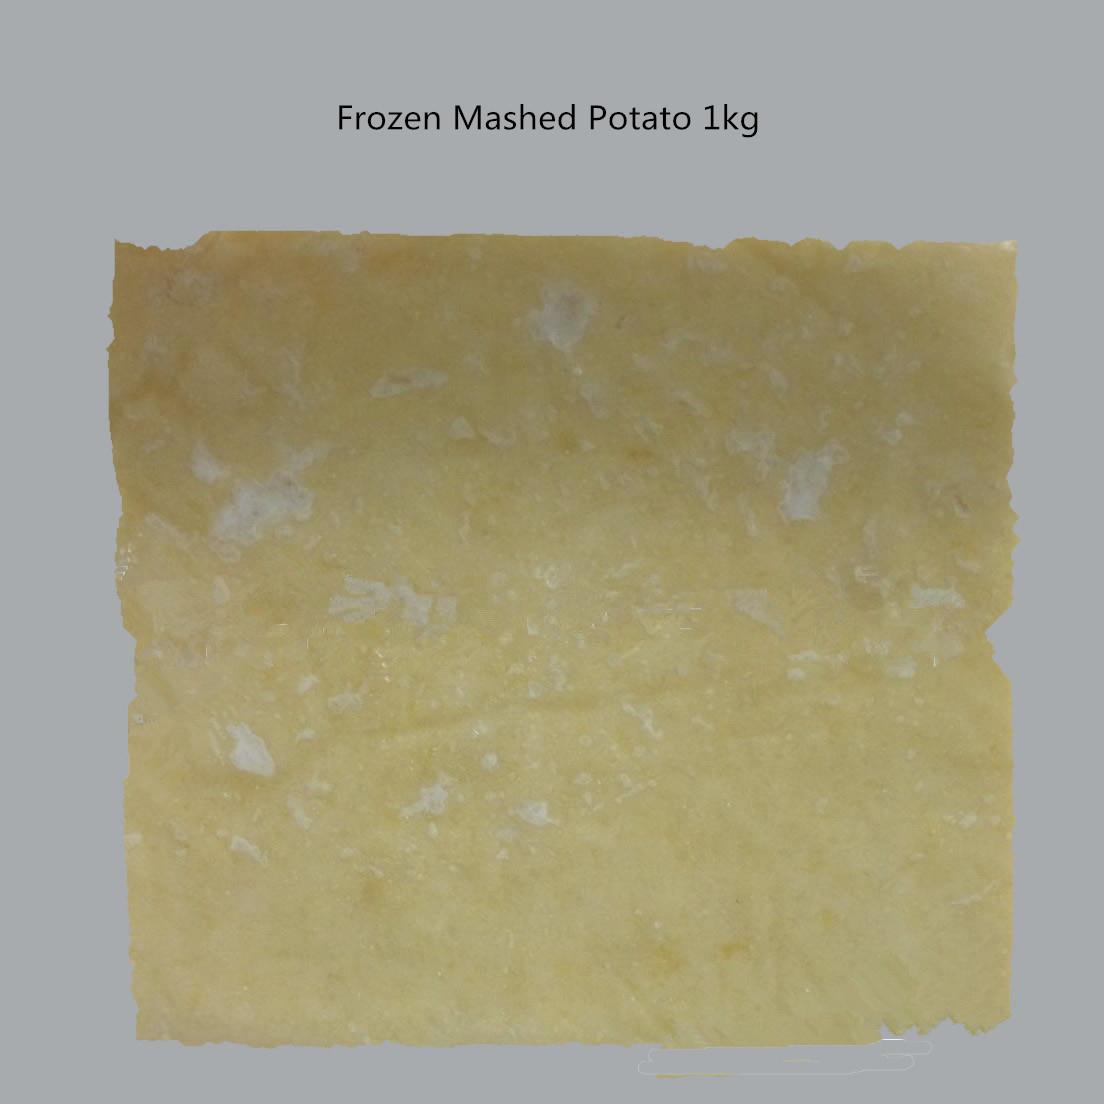 frozen mashed potato block